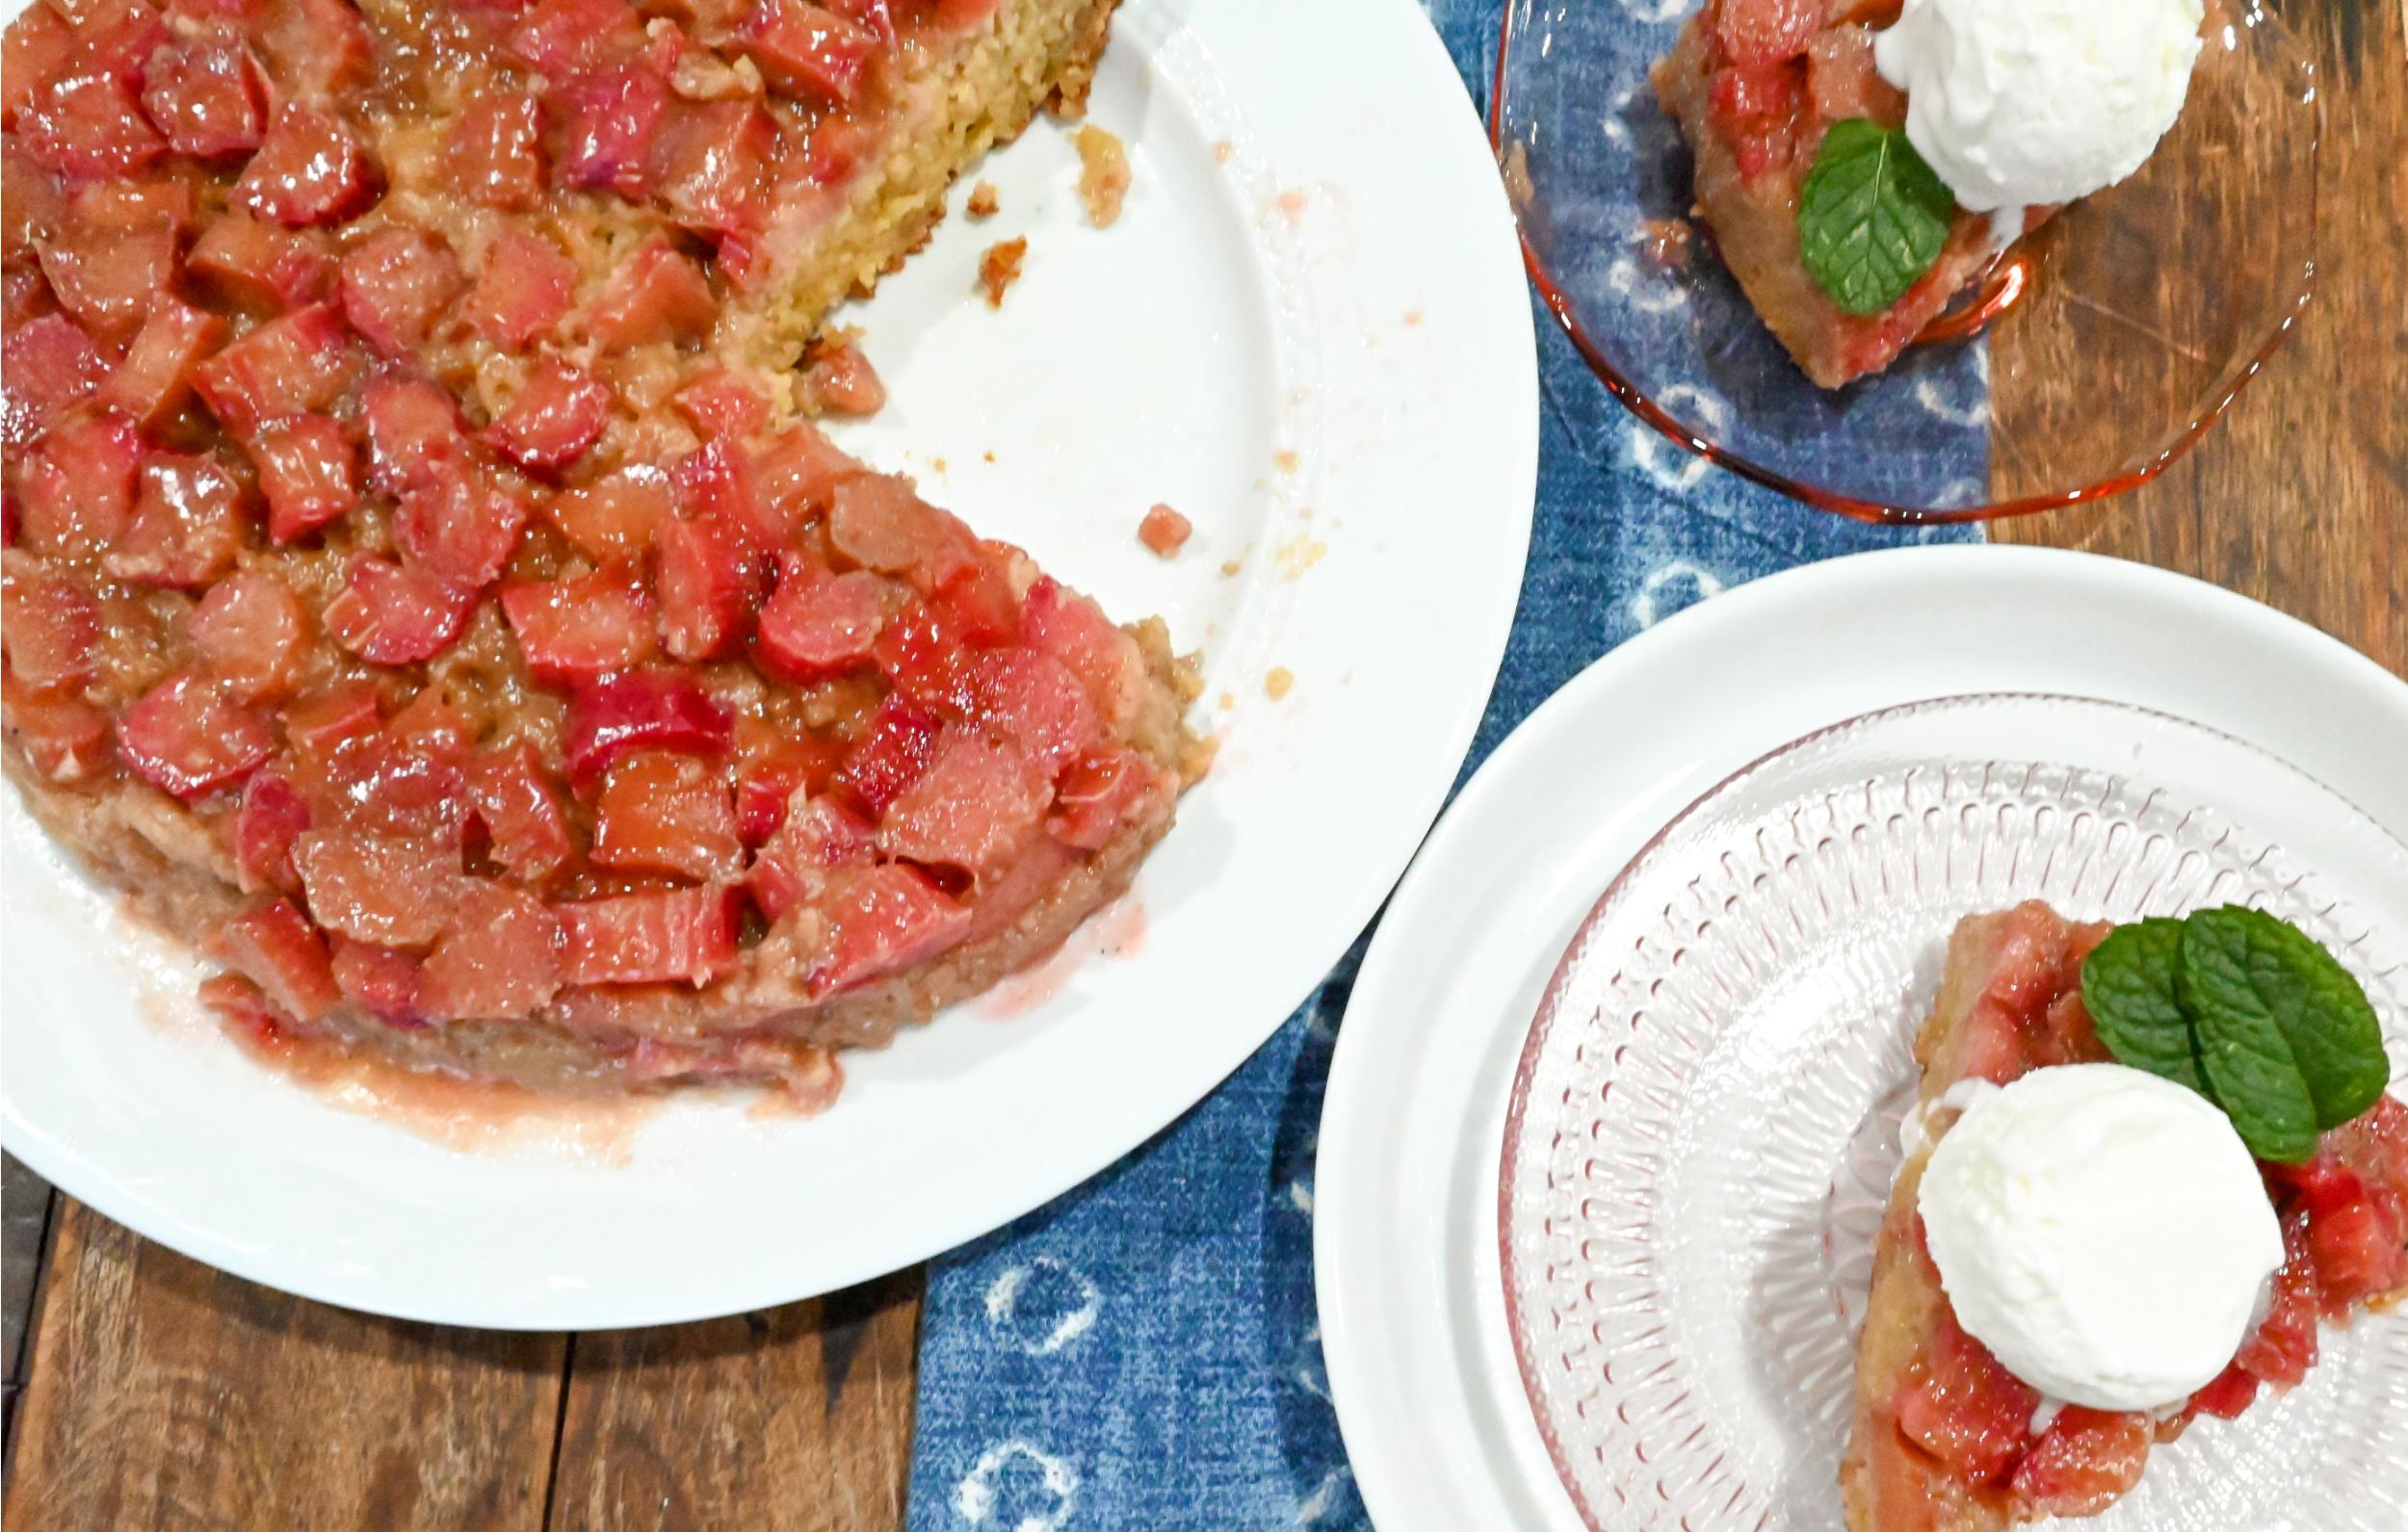 keto rhubarb upside down cake on a white cake plate